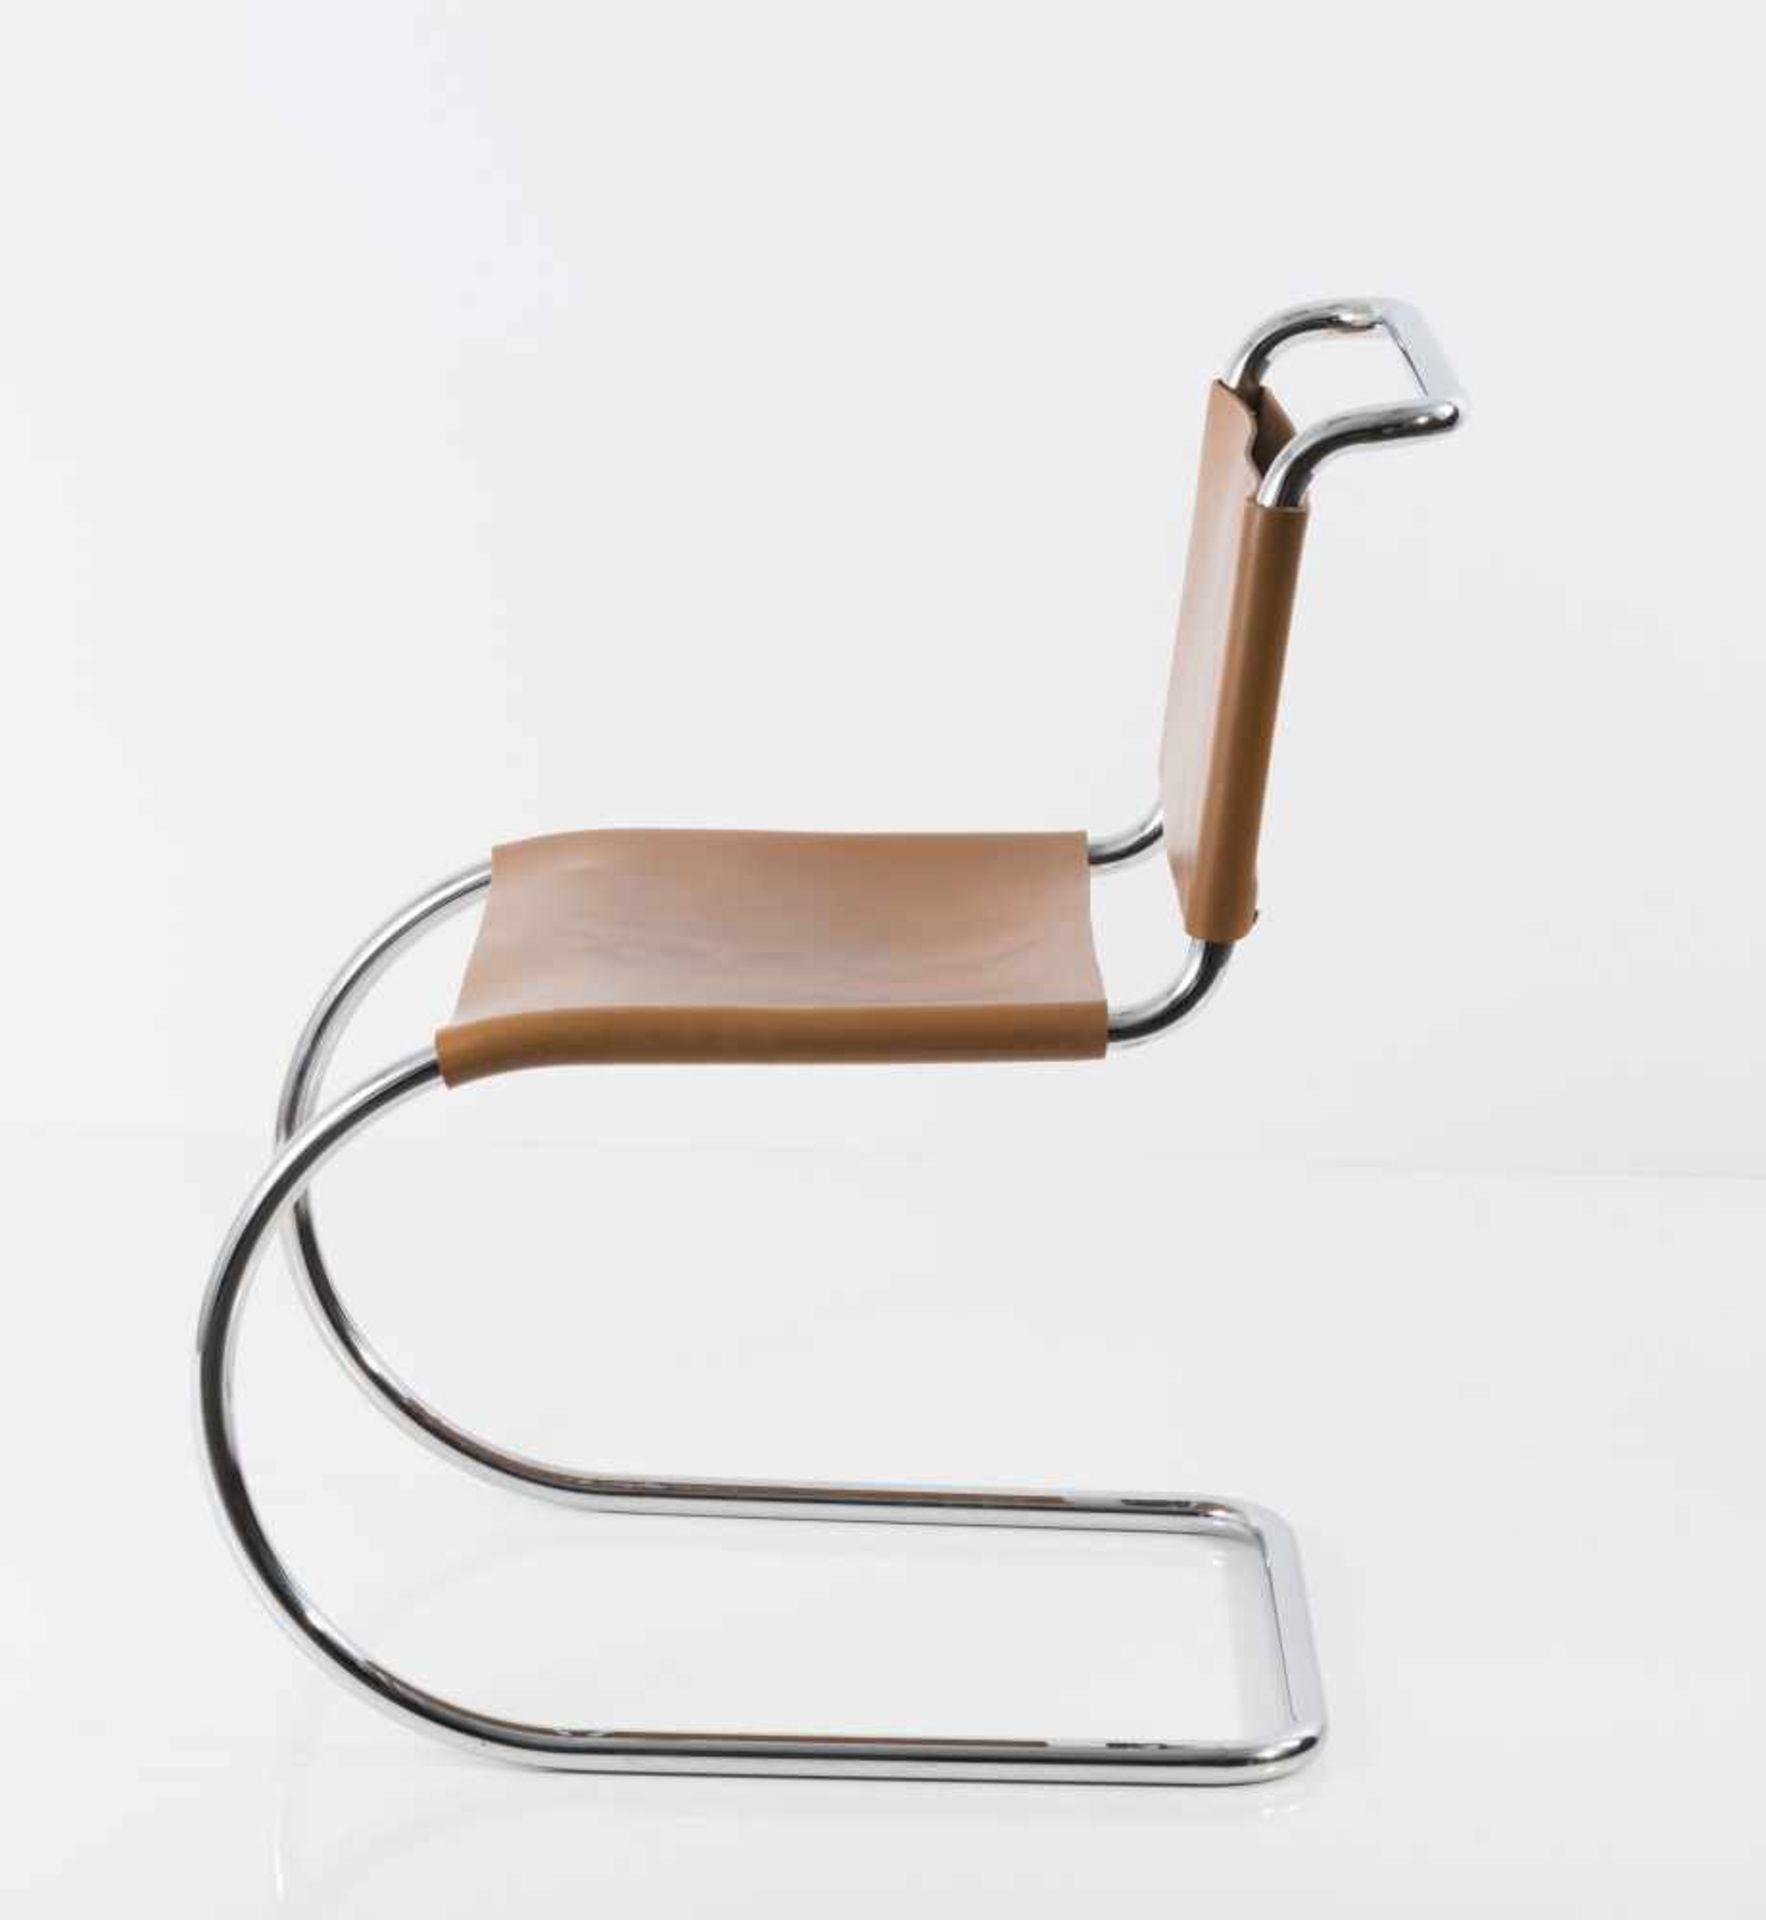 Ludwig Mies van der Rohe Sechs Stühle 'MR 10', 1927 H. 79 x 49 x 71 cm. Knoll International, New - Bild 4 aus 5